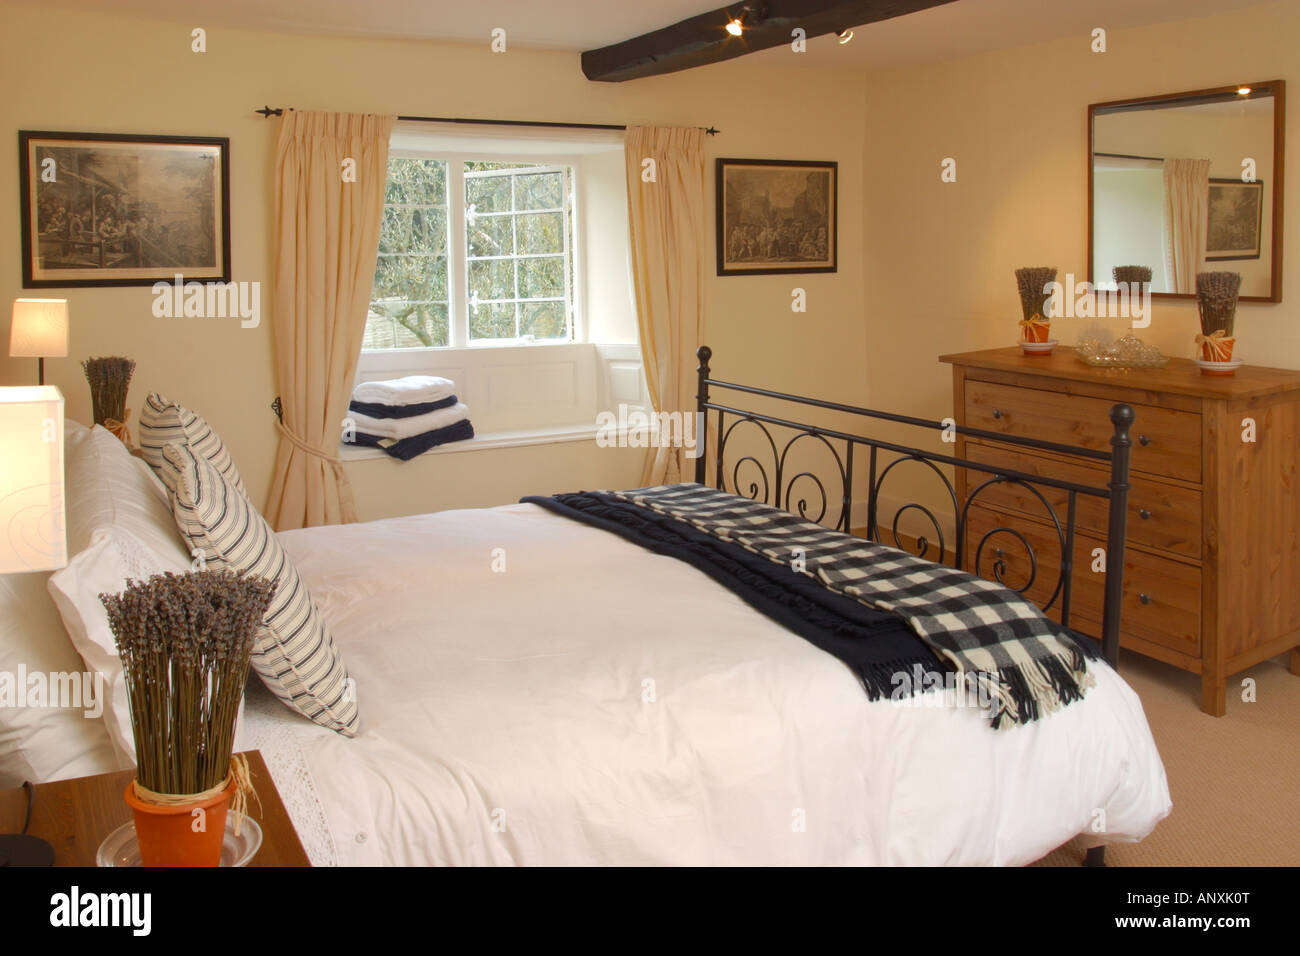 English Style Interior Stockfotos & English Style Interior Bilder ...